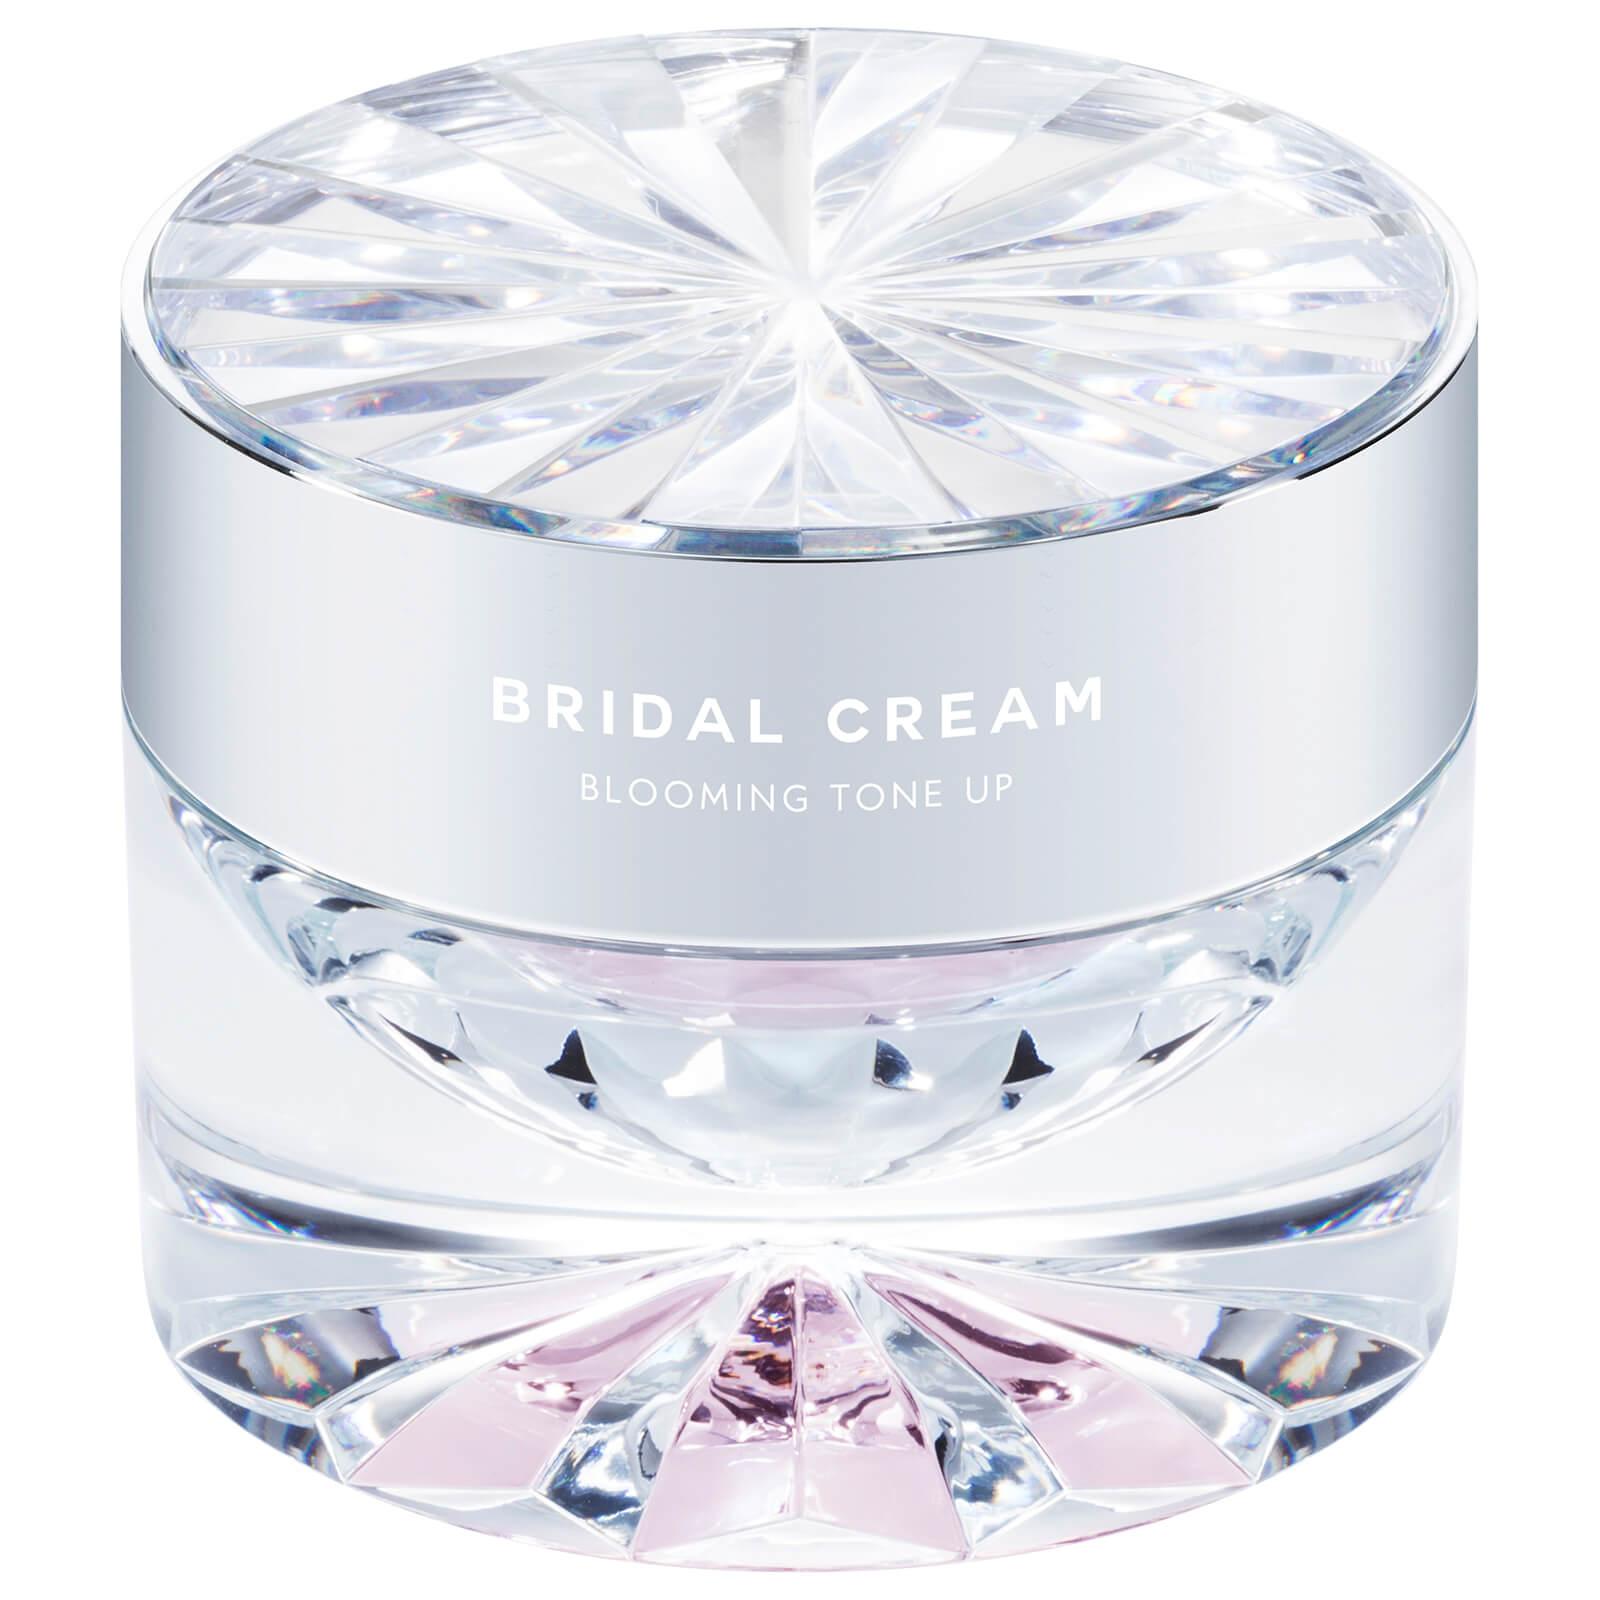 MISSHA Time Revolution Bridal Cream - Blooming Tone Up 50ml